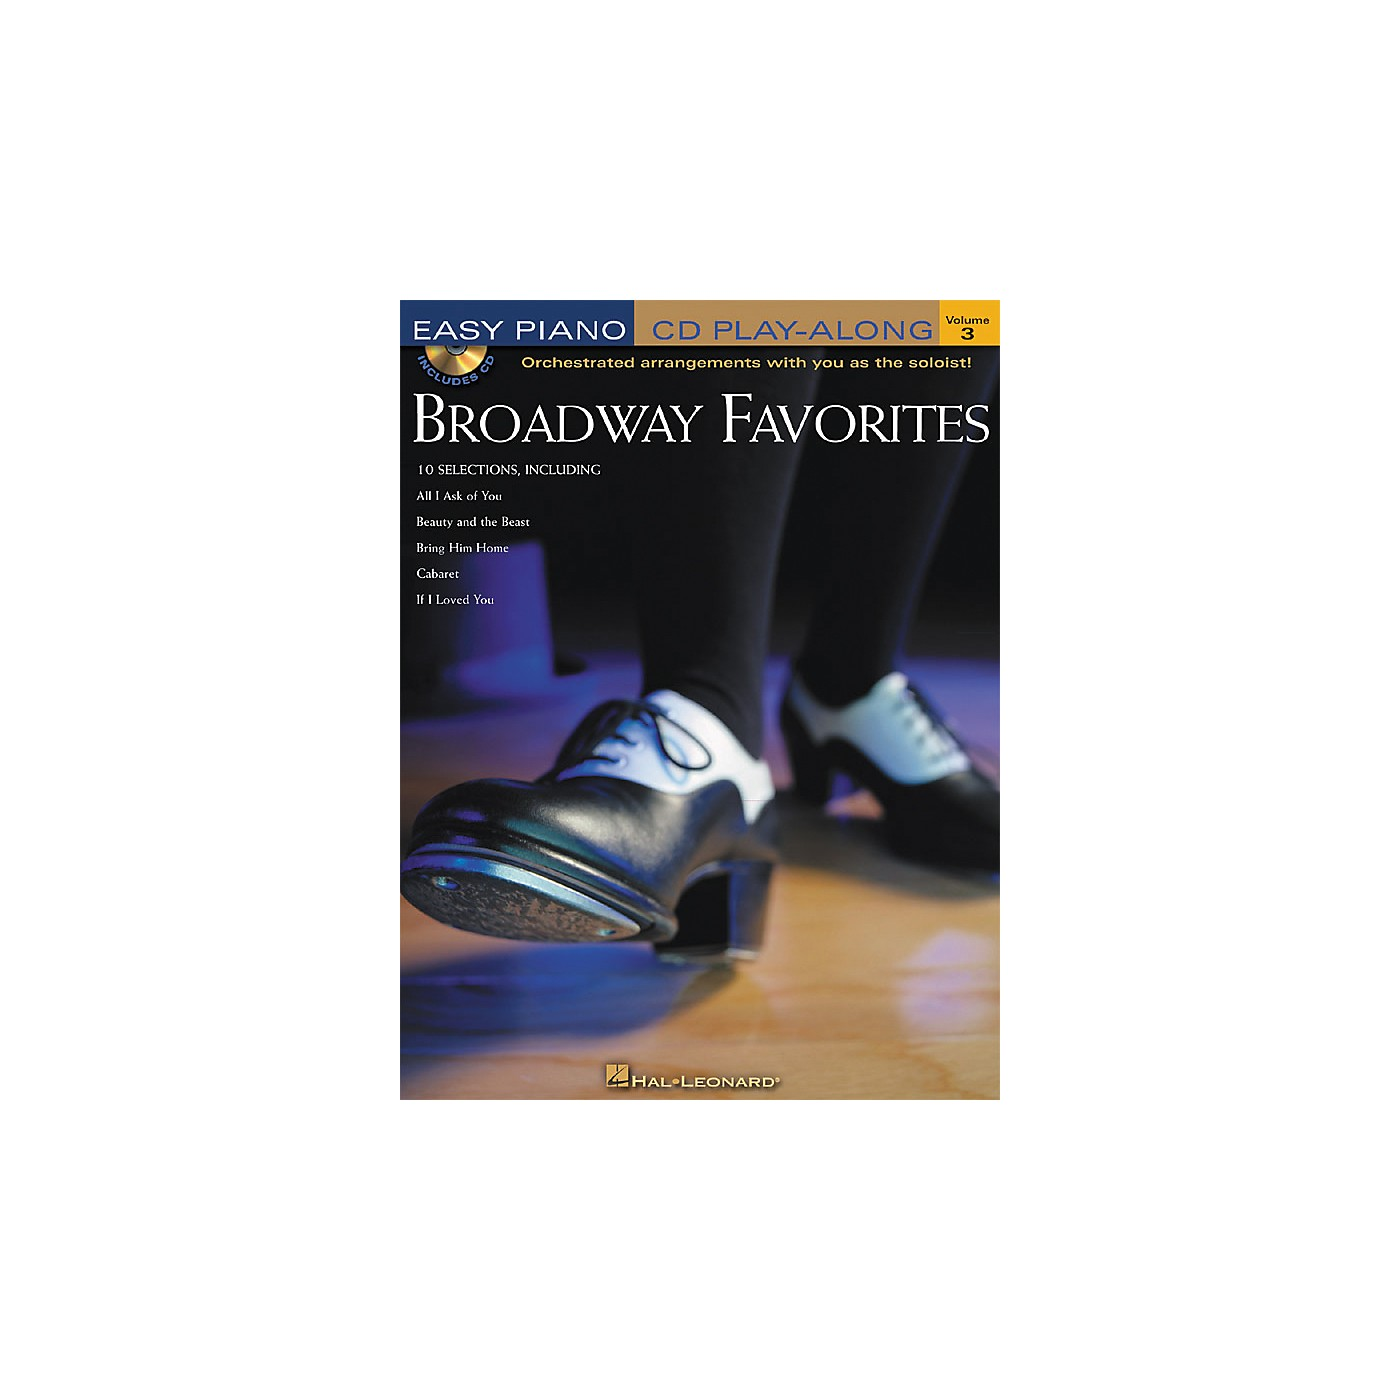 Hal Leonard Broadway Favorites Volume 3 Book/CD Easy Piano CD Play-Along thumbnail